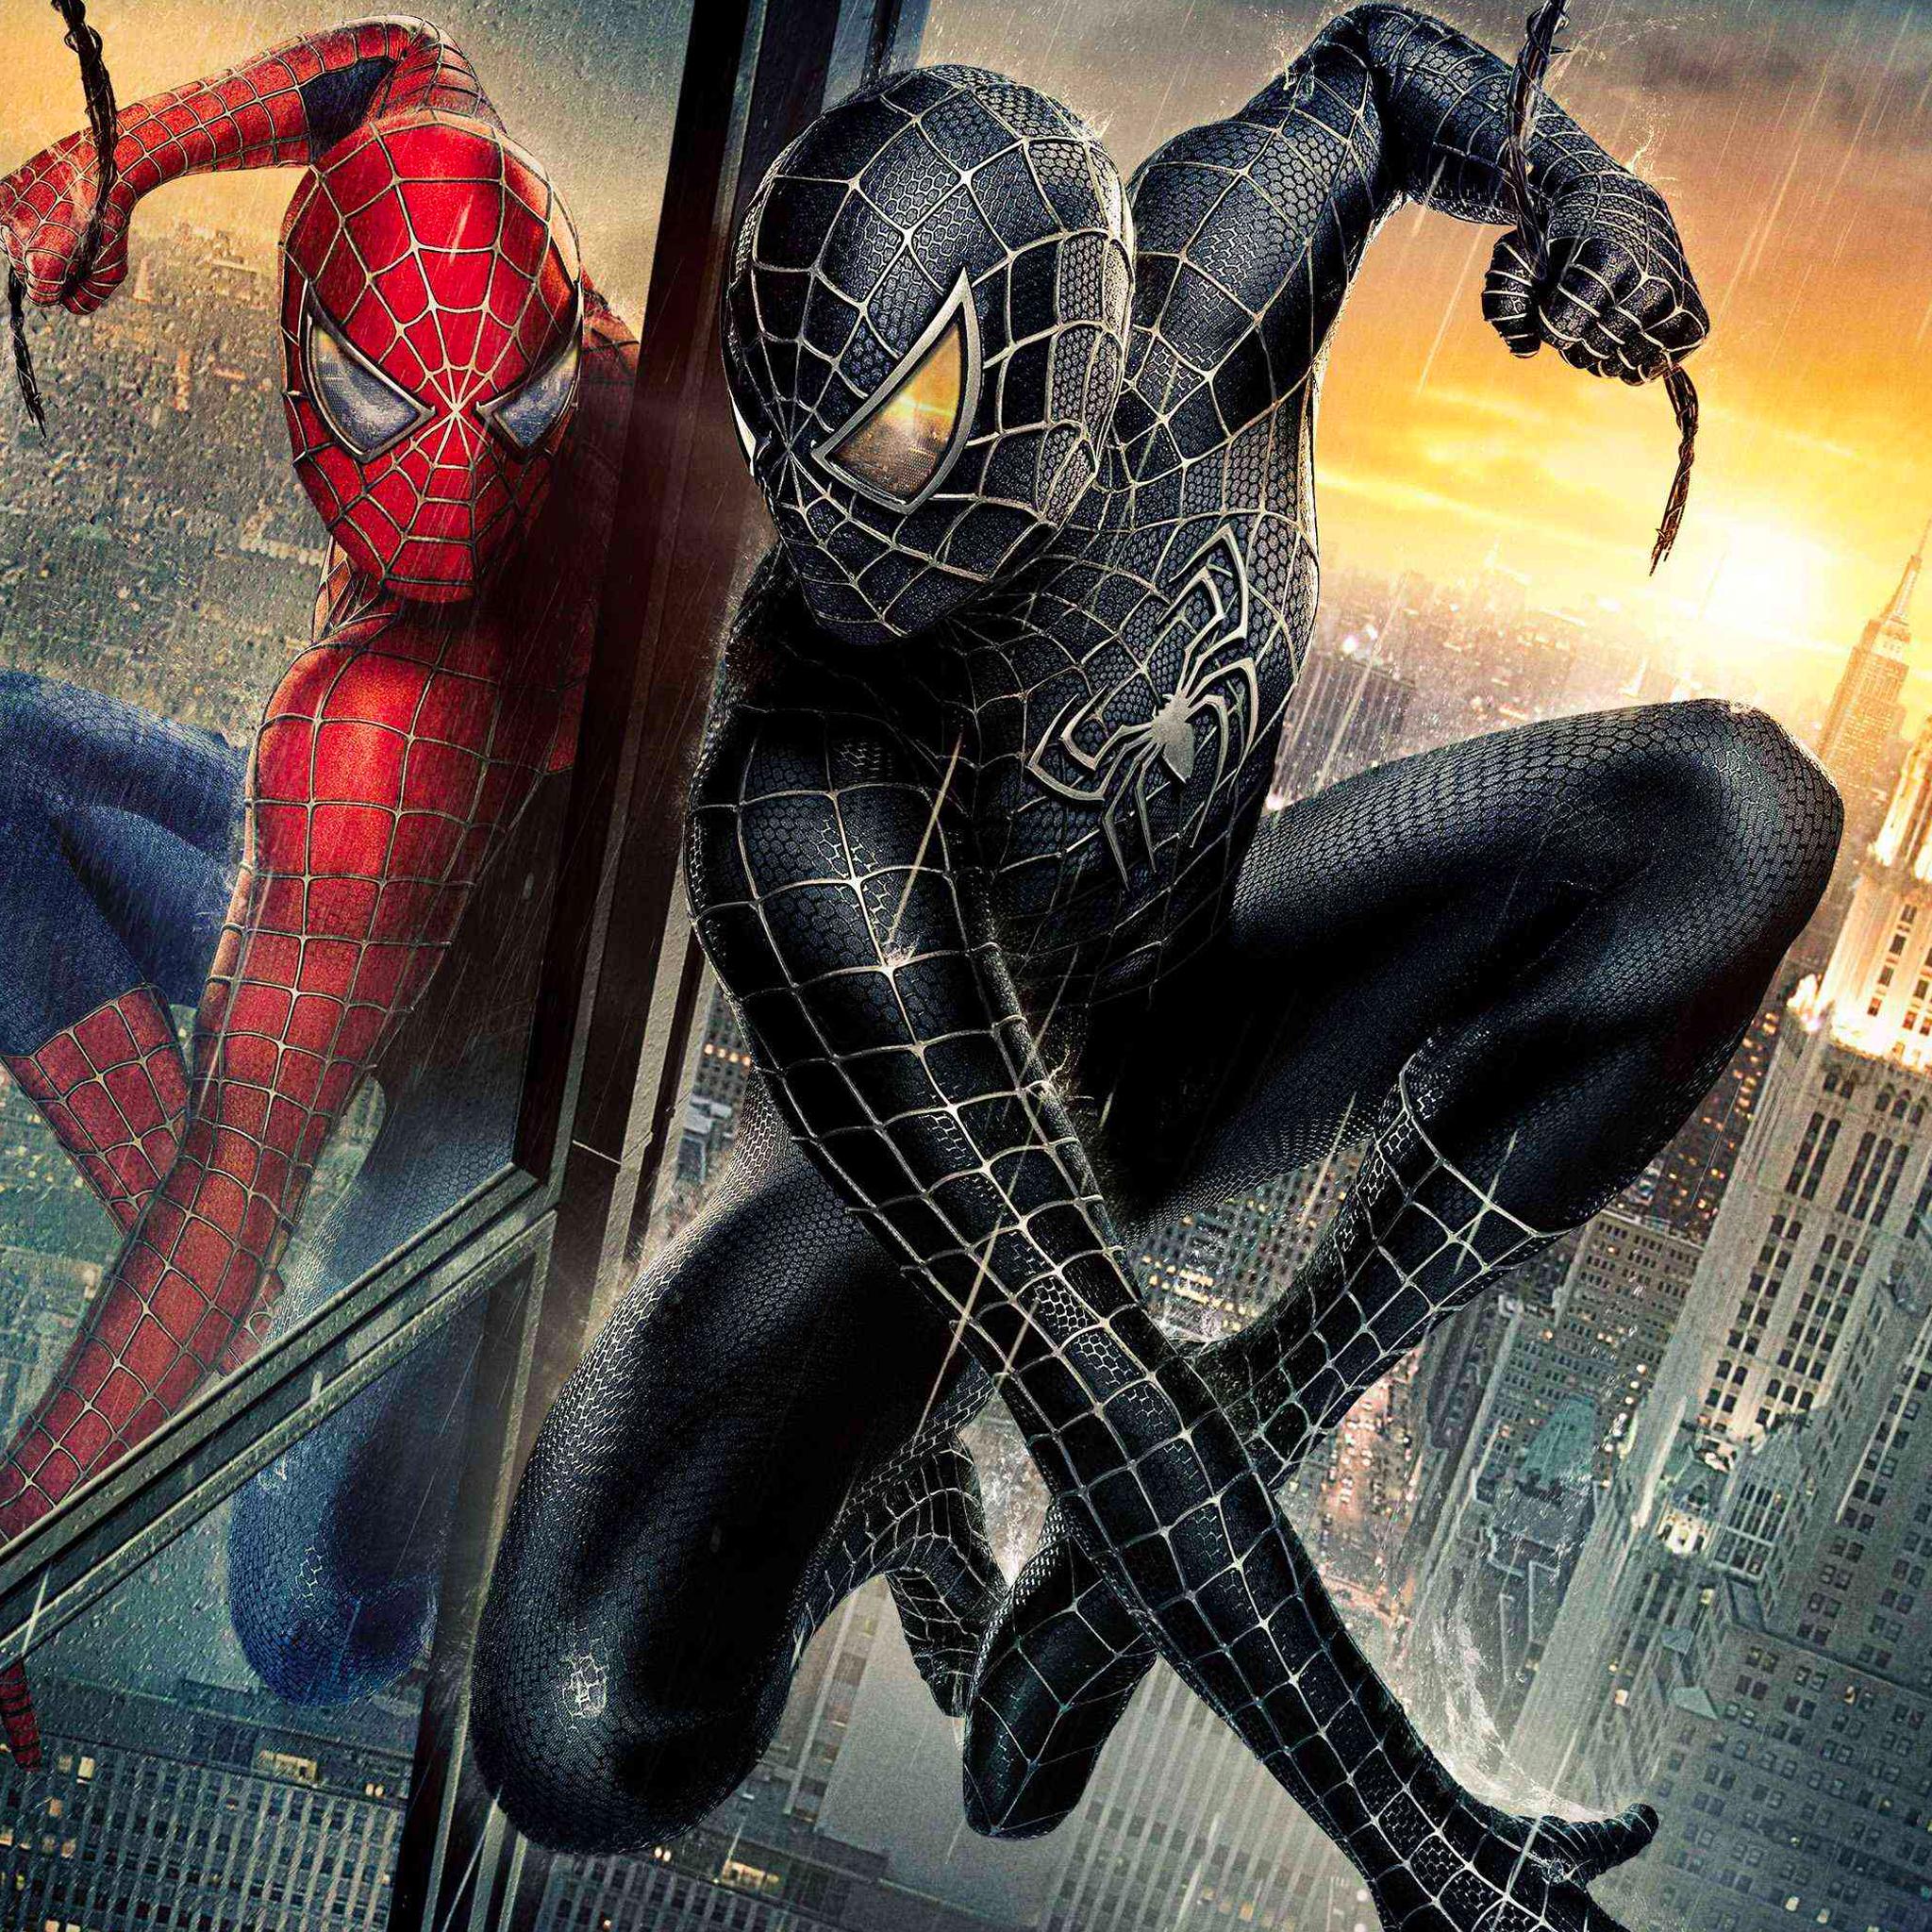 Spider_Man_3_3_Wallpapers_iPad